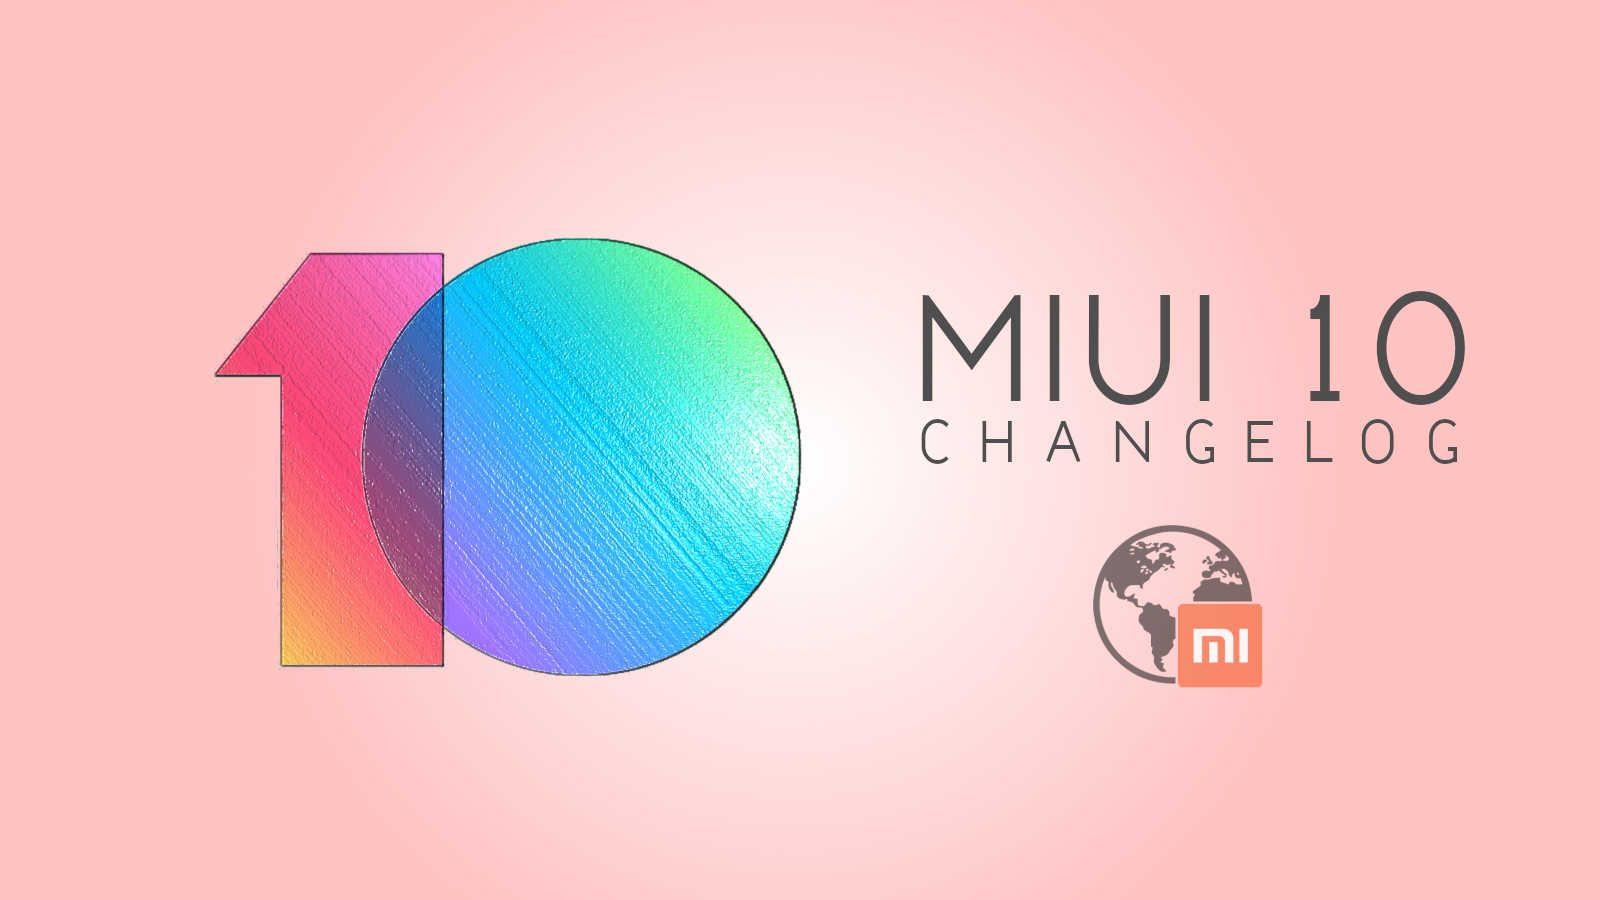 MiUI 9 4 11 Changelog v10 mi-globe ROM - mi-globe com